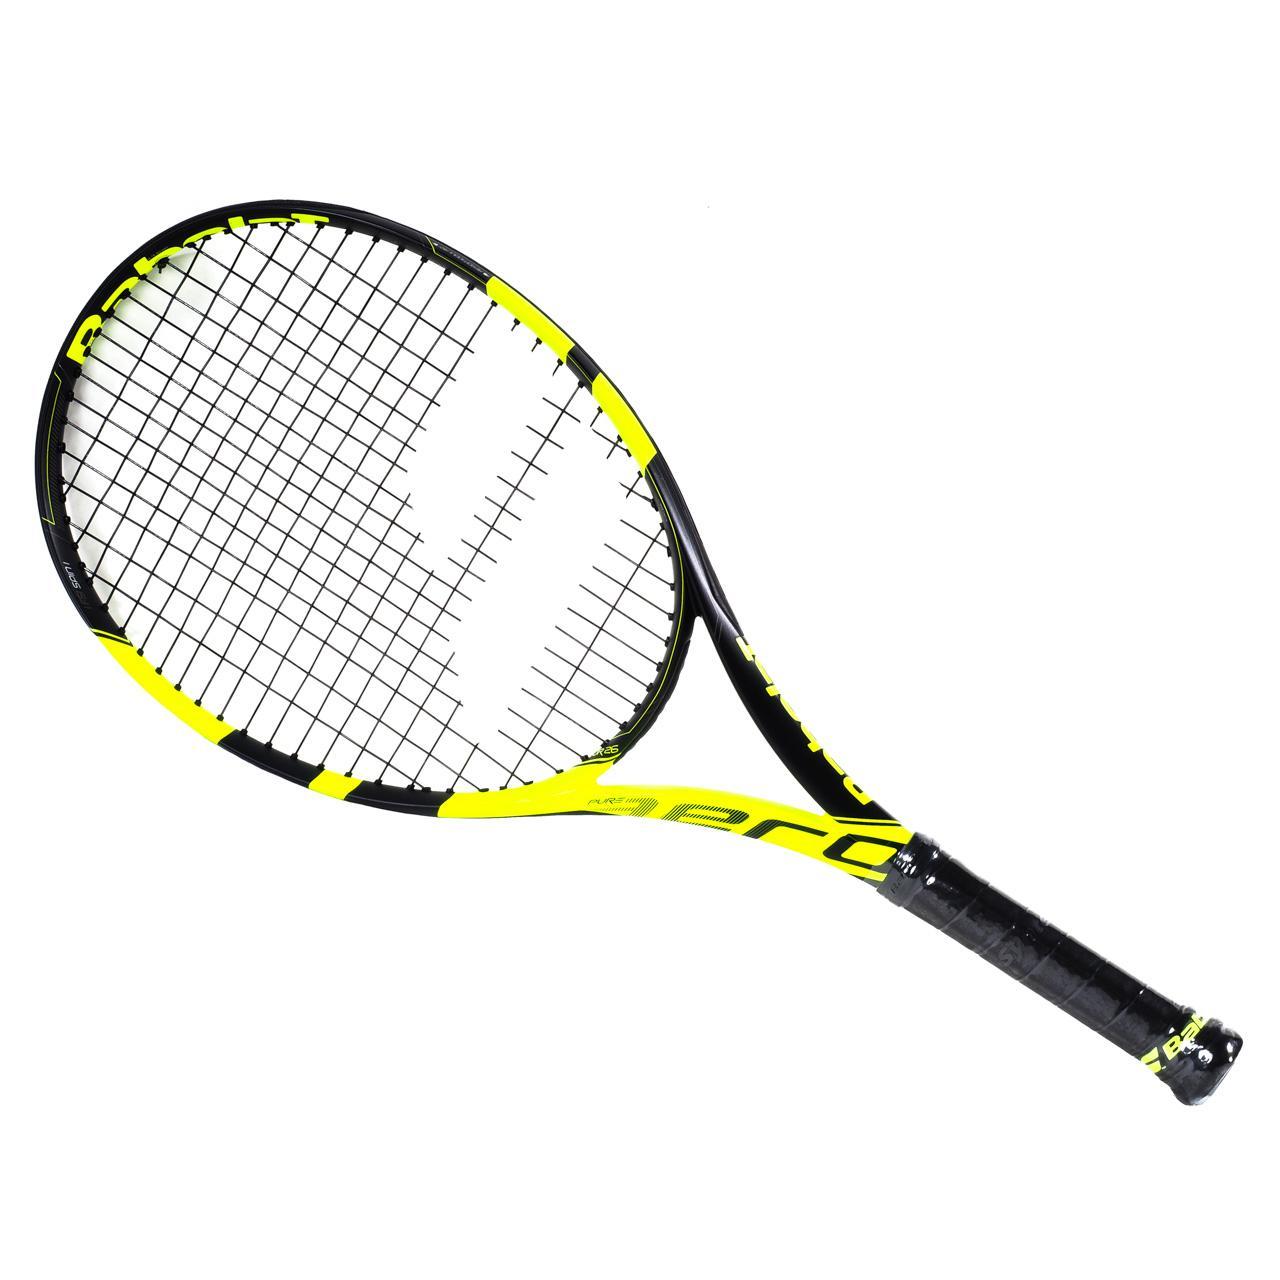 raquette de tennis babolat pure aero jr 26 2016 noir 78305 neuf ebay. Black Bedroom Furniture Sets. Home Design Ideas